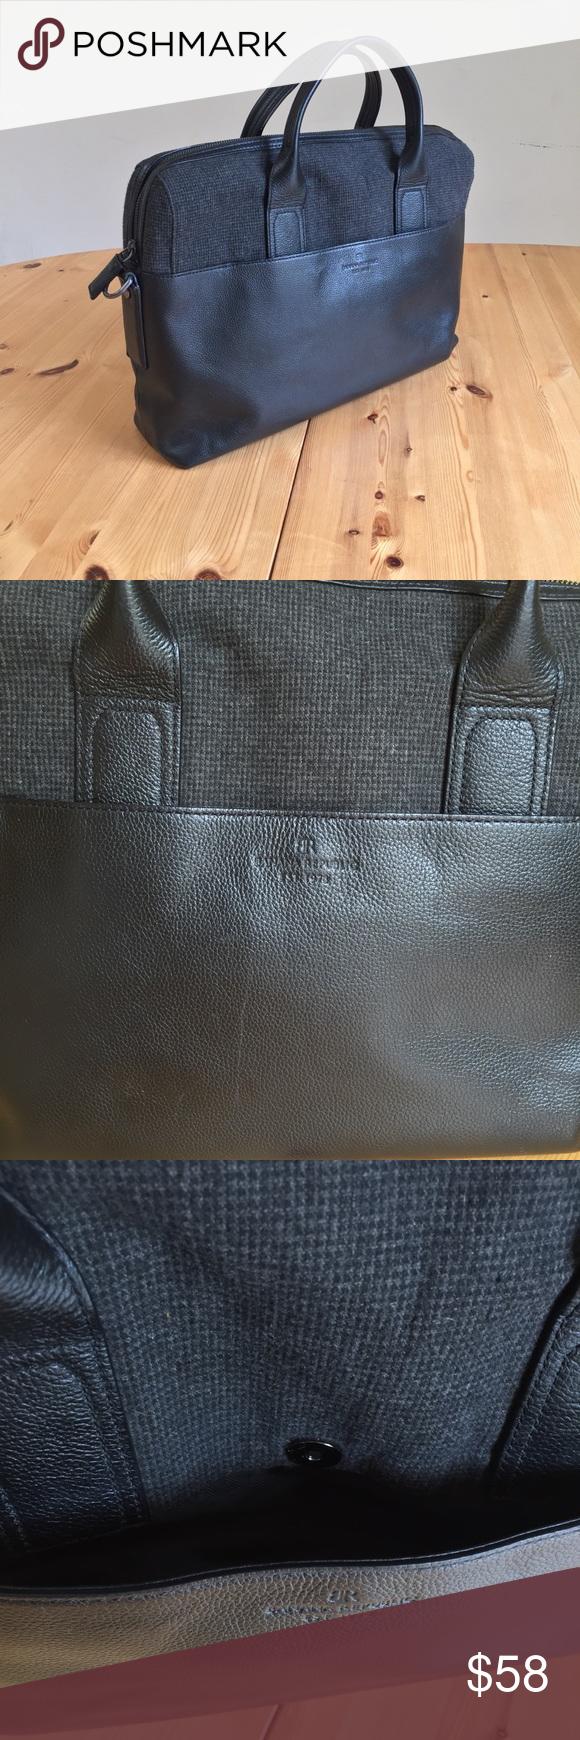 Banana Republic Black Leather Briefcase 👜 Banana Republic briefcase bag  from FW2014 mens collection. Black 15fc1f81ea